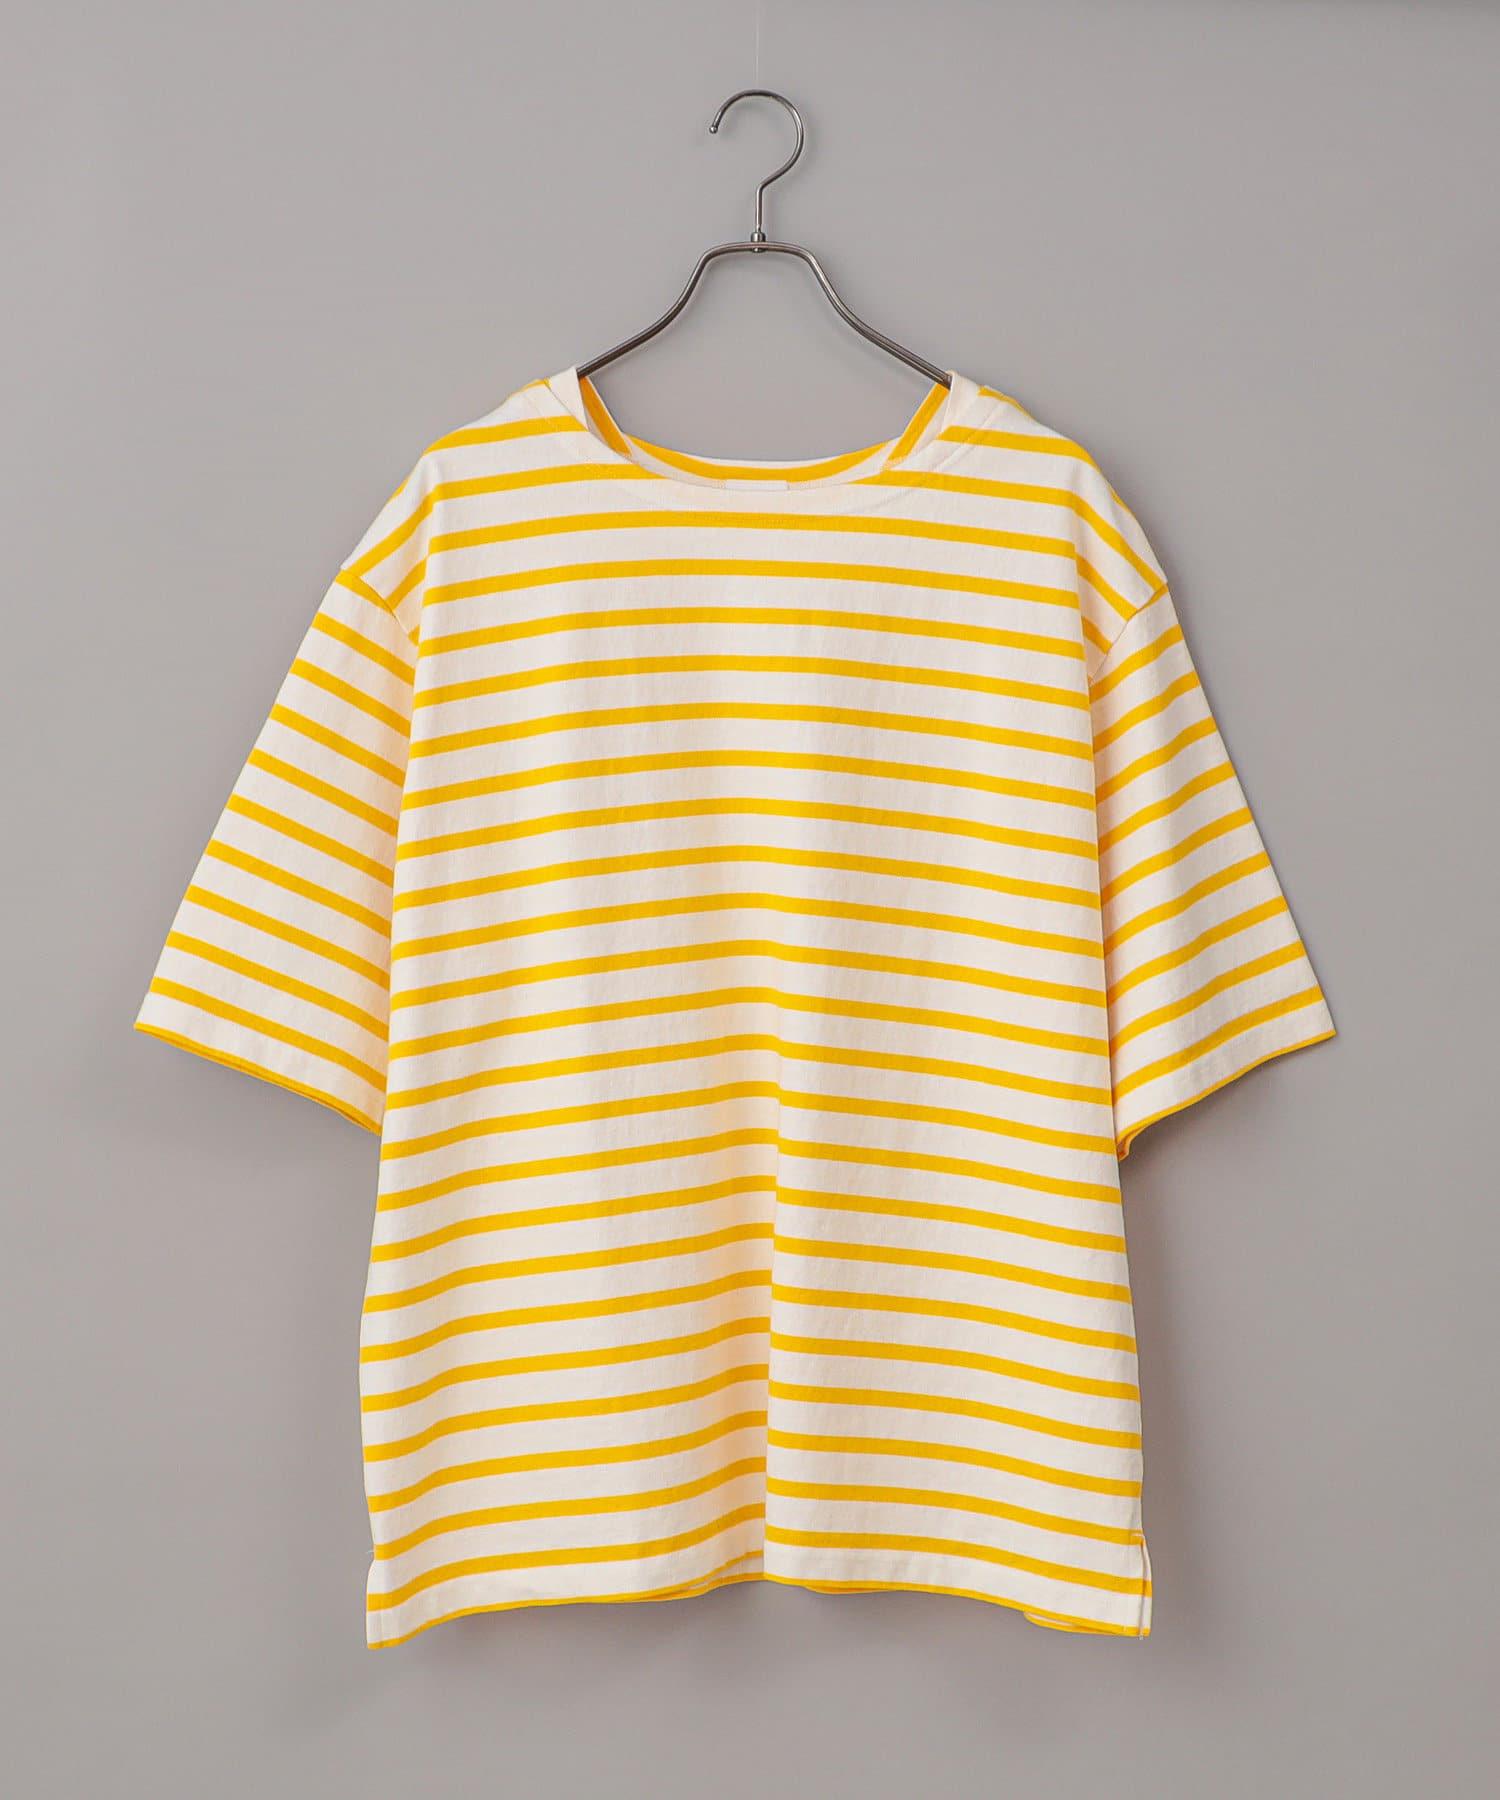 CIAOPANIC(チャオパニック) 【ユニセックスで着用可能!!】バスクボーダーショートスリーブTシャツ